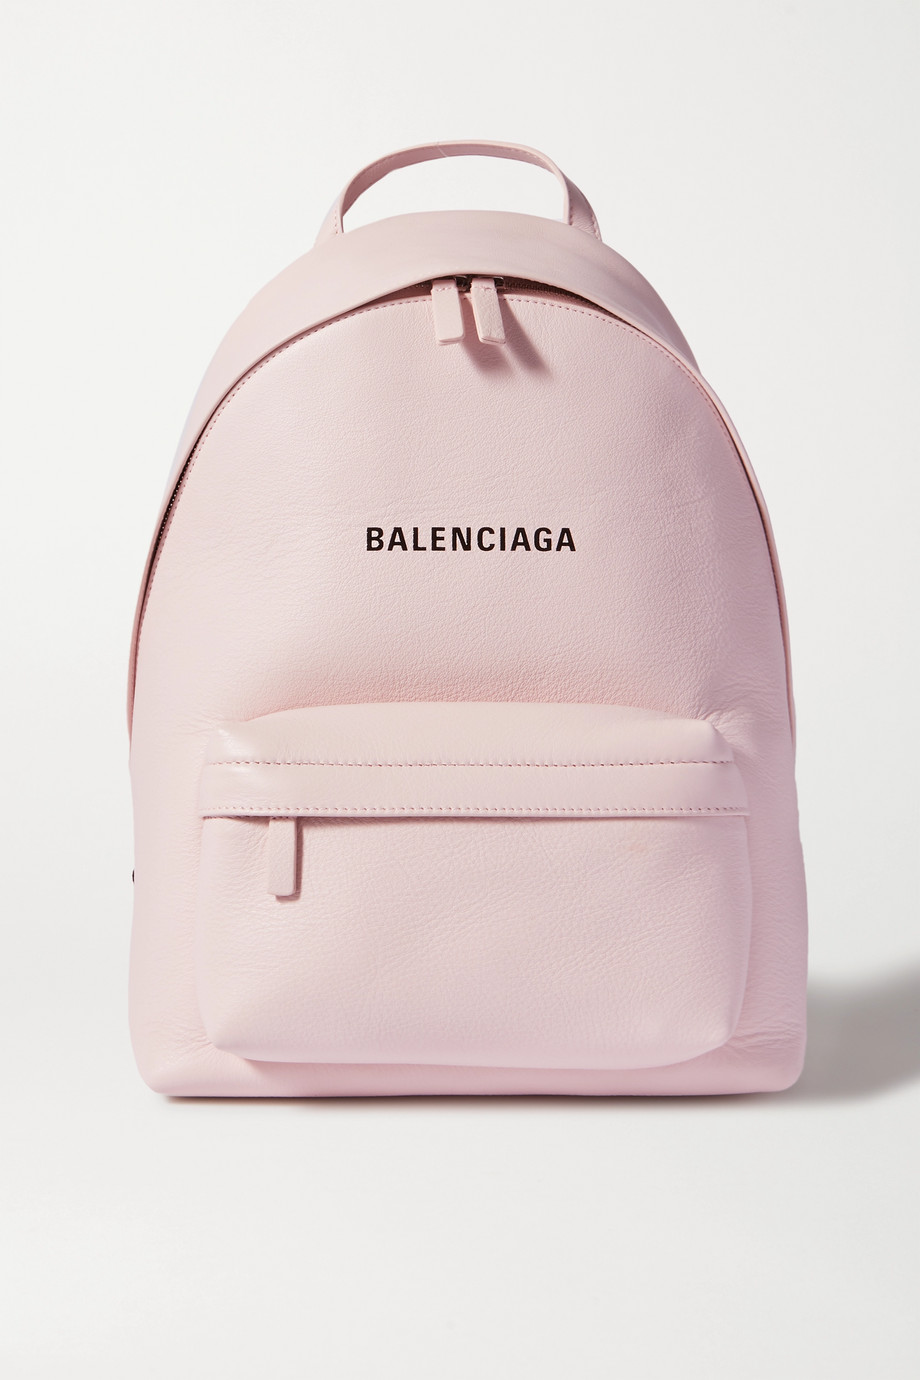 Balenciaga Everyday printed leather backpack